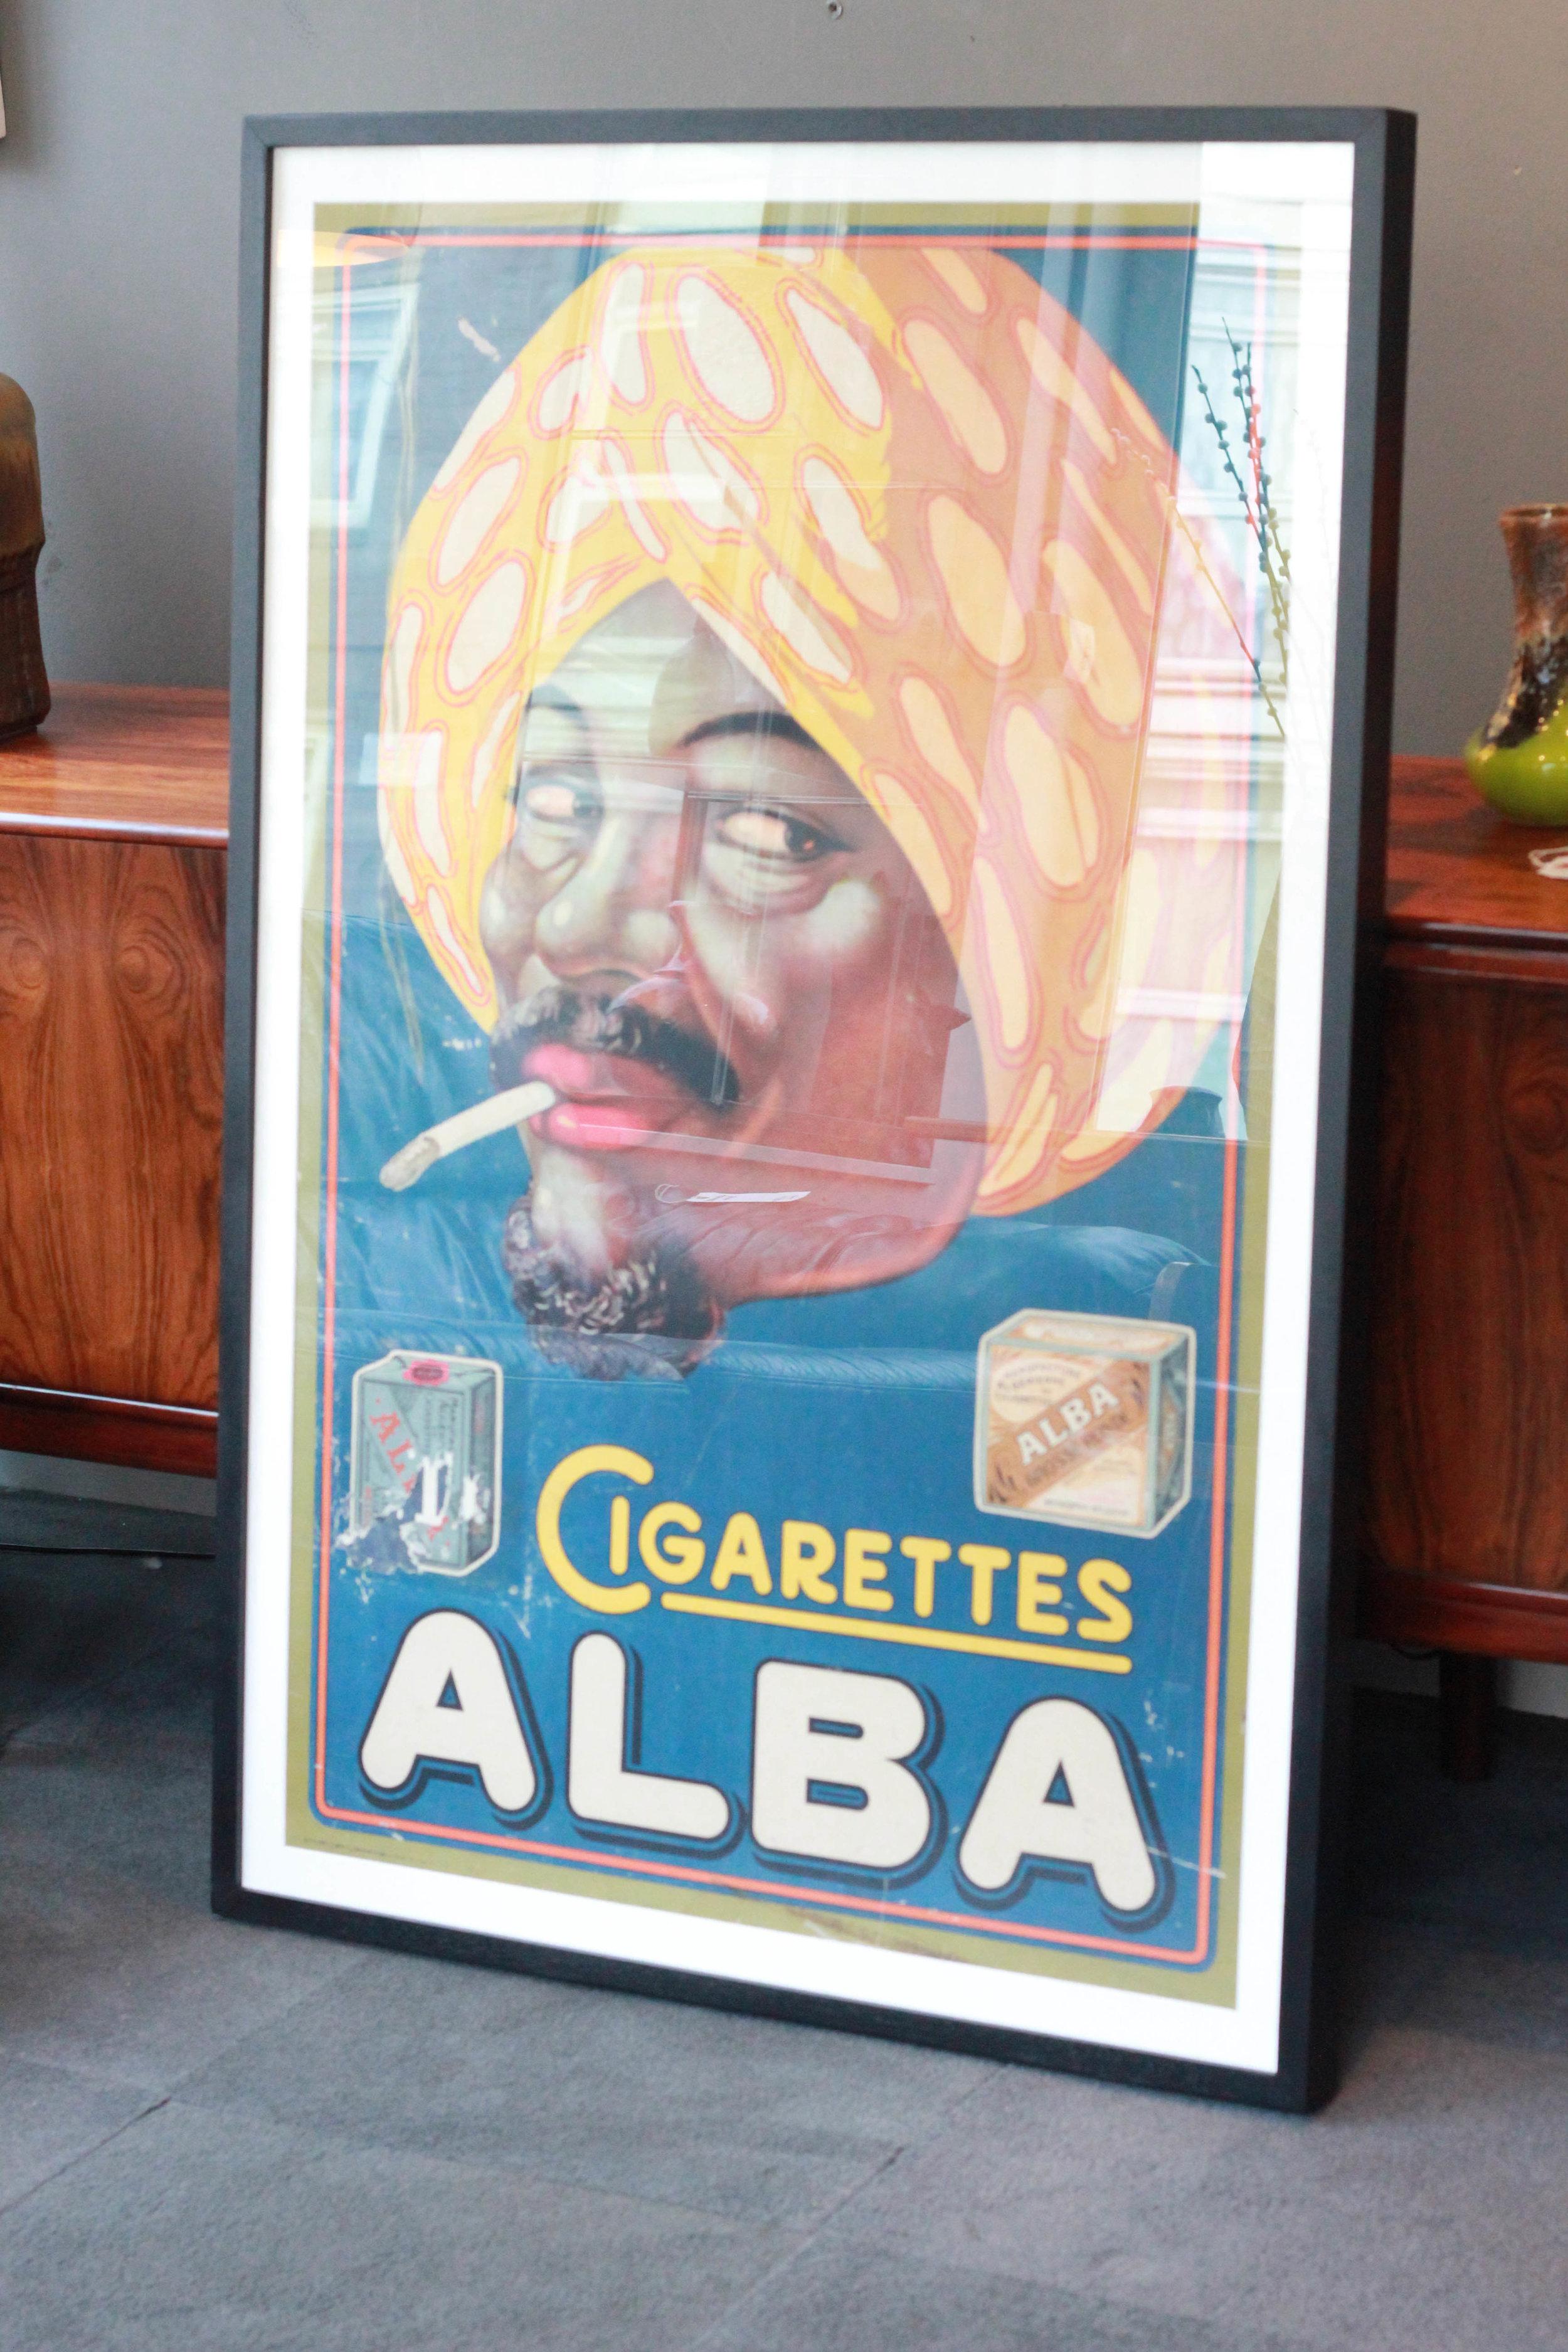 Original Alba Cigarette Poster, Framed £1200